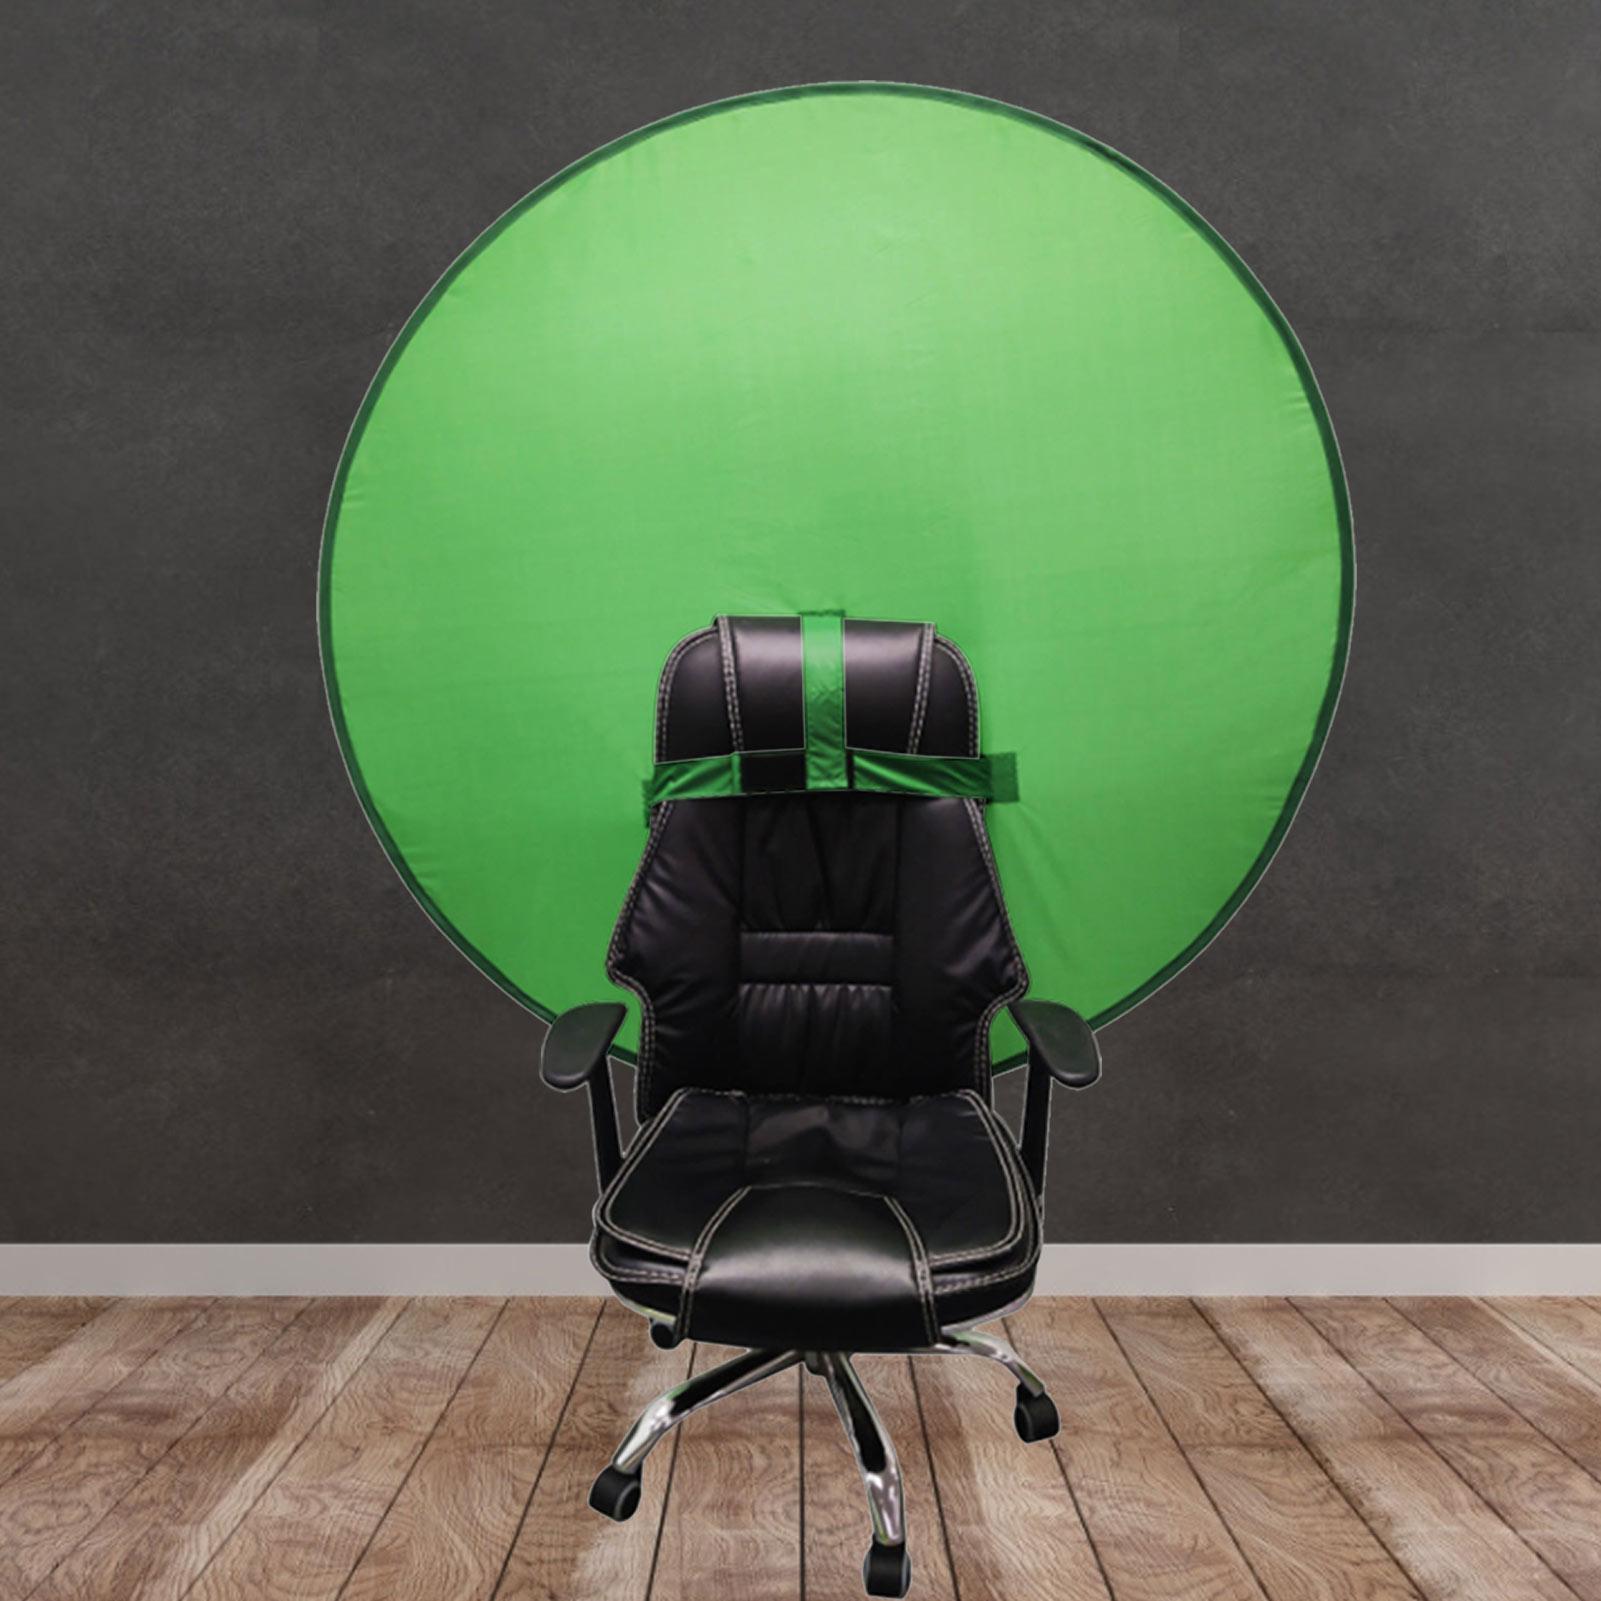 green-screen-circular-photography-backgr_main-6